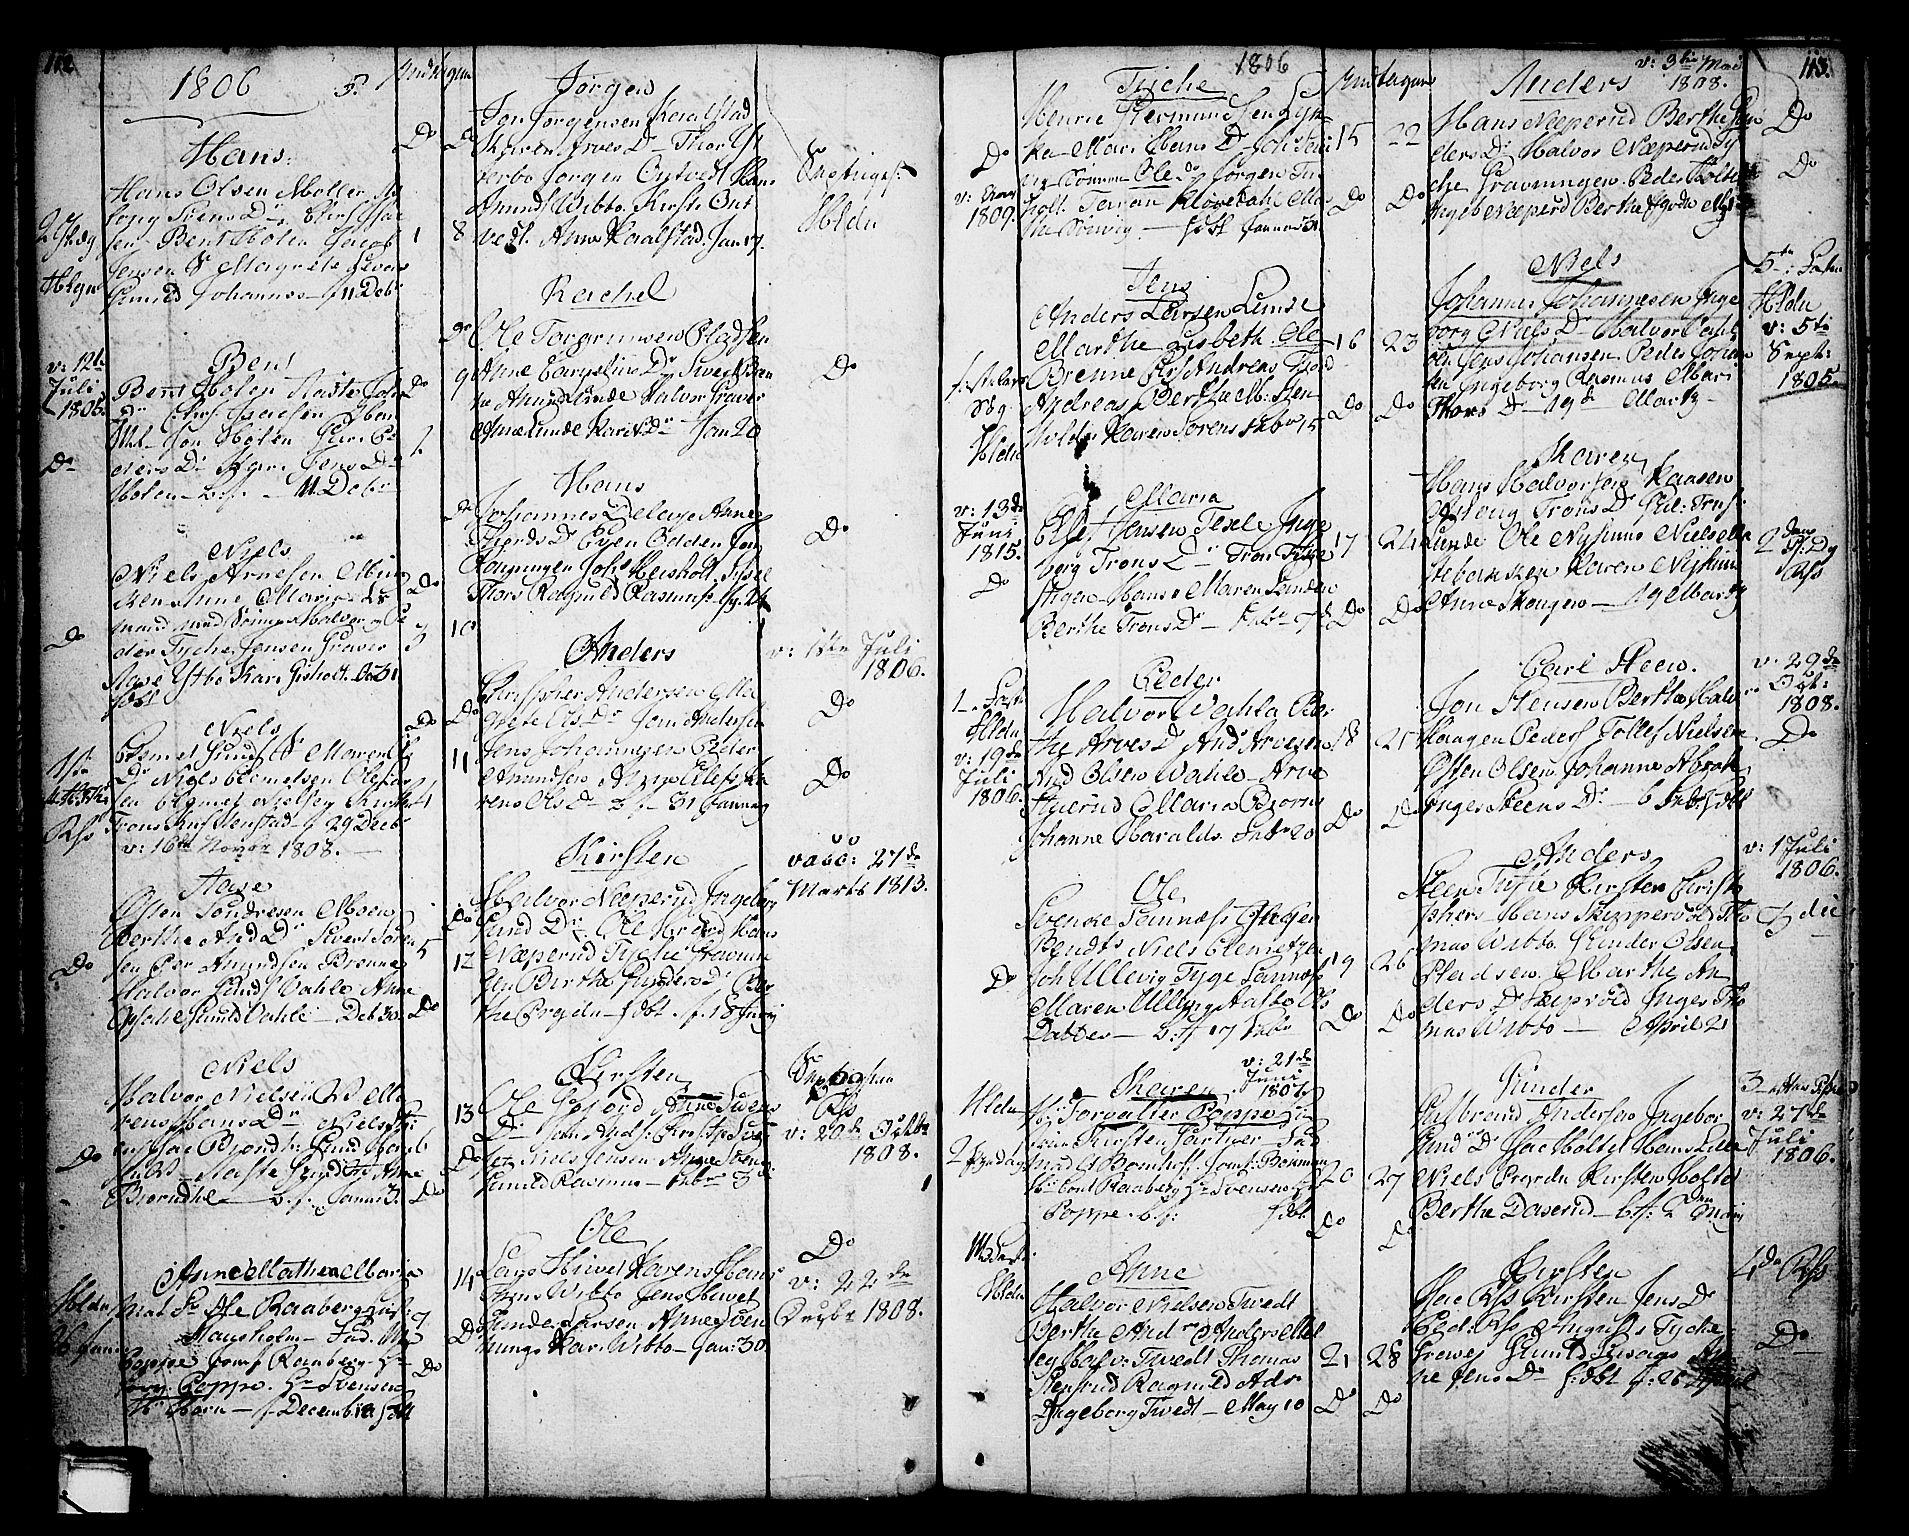 SAKO, Holla kirkebøker, F/Fa/L0002: Ministerialbok nr. 2, 1779-1814, s. 112-113